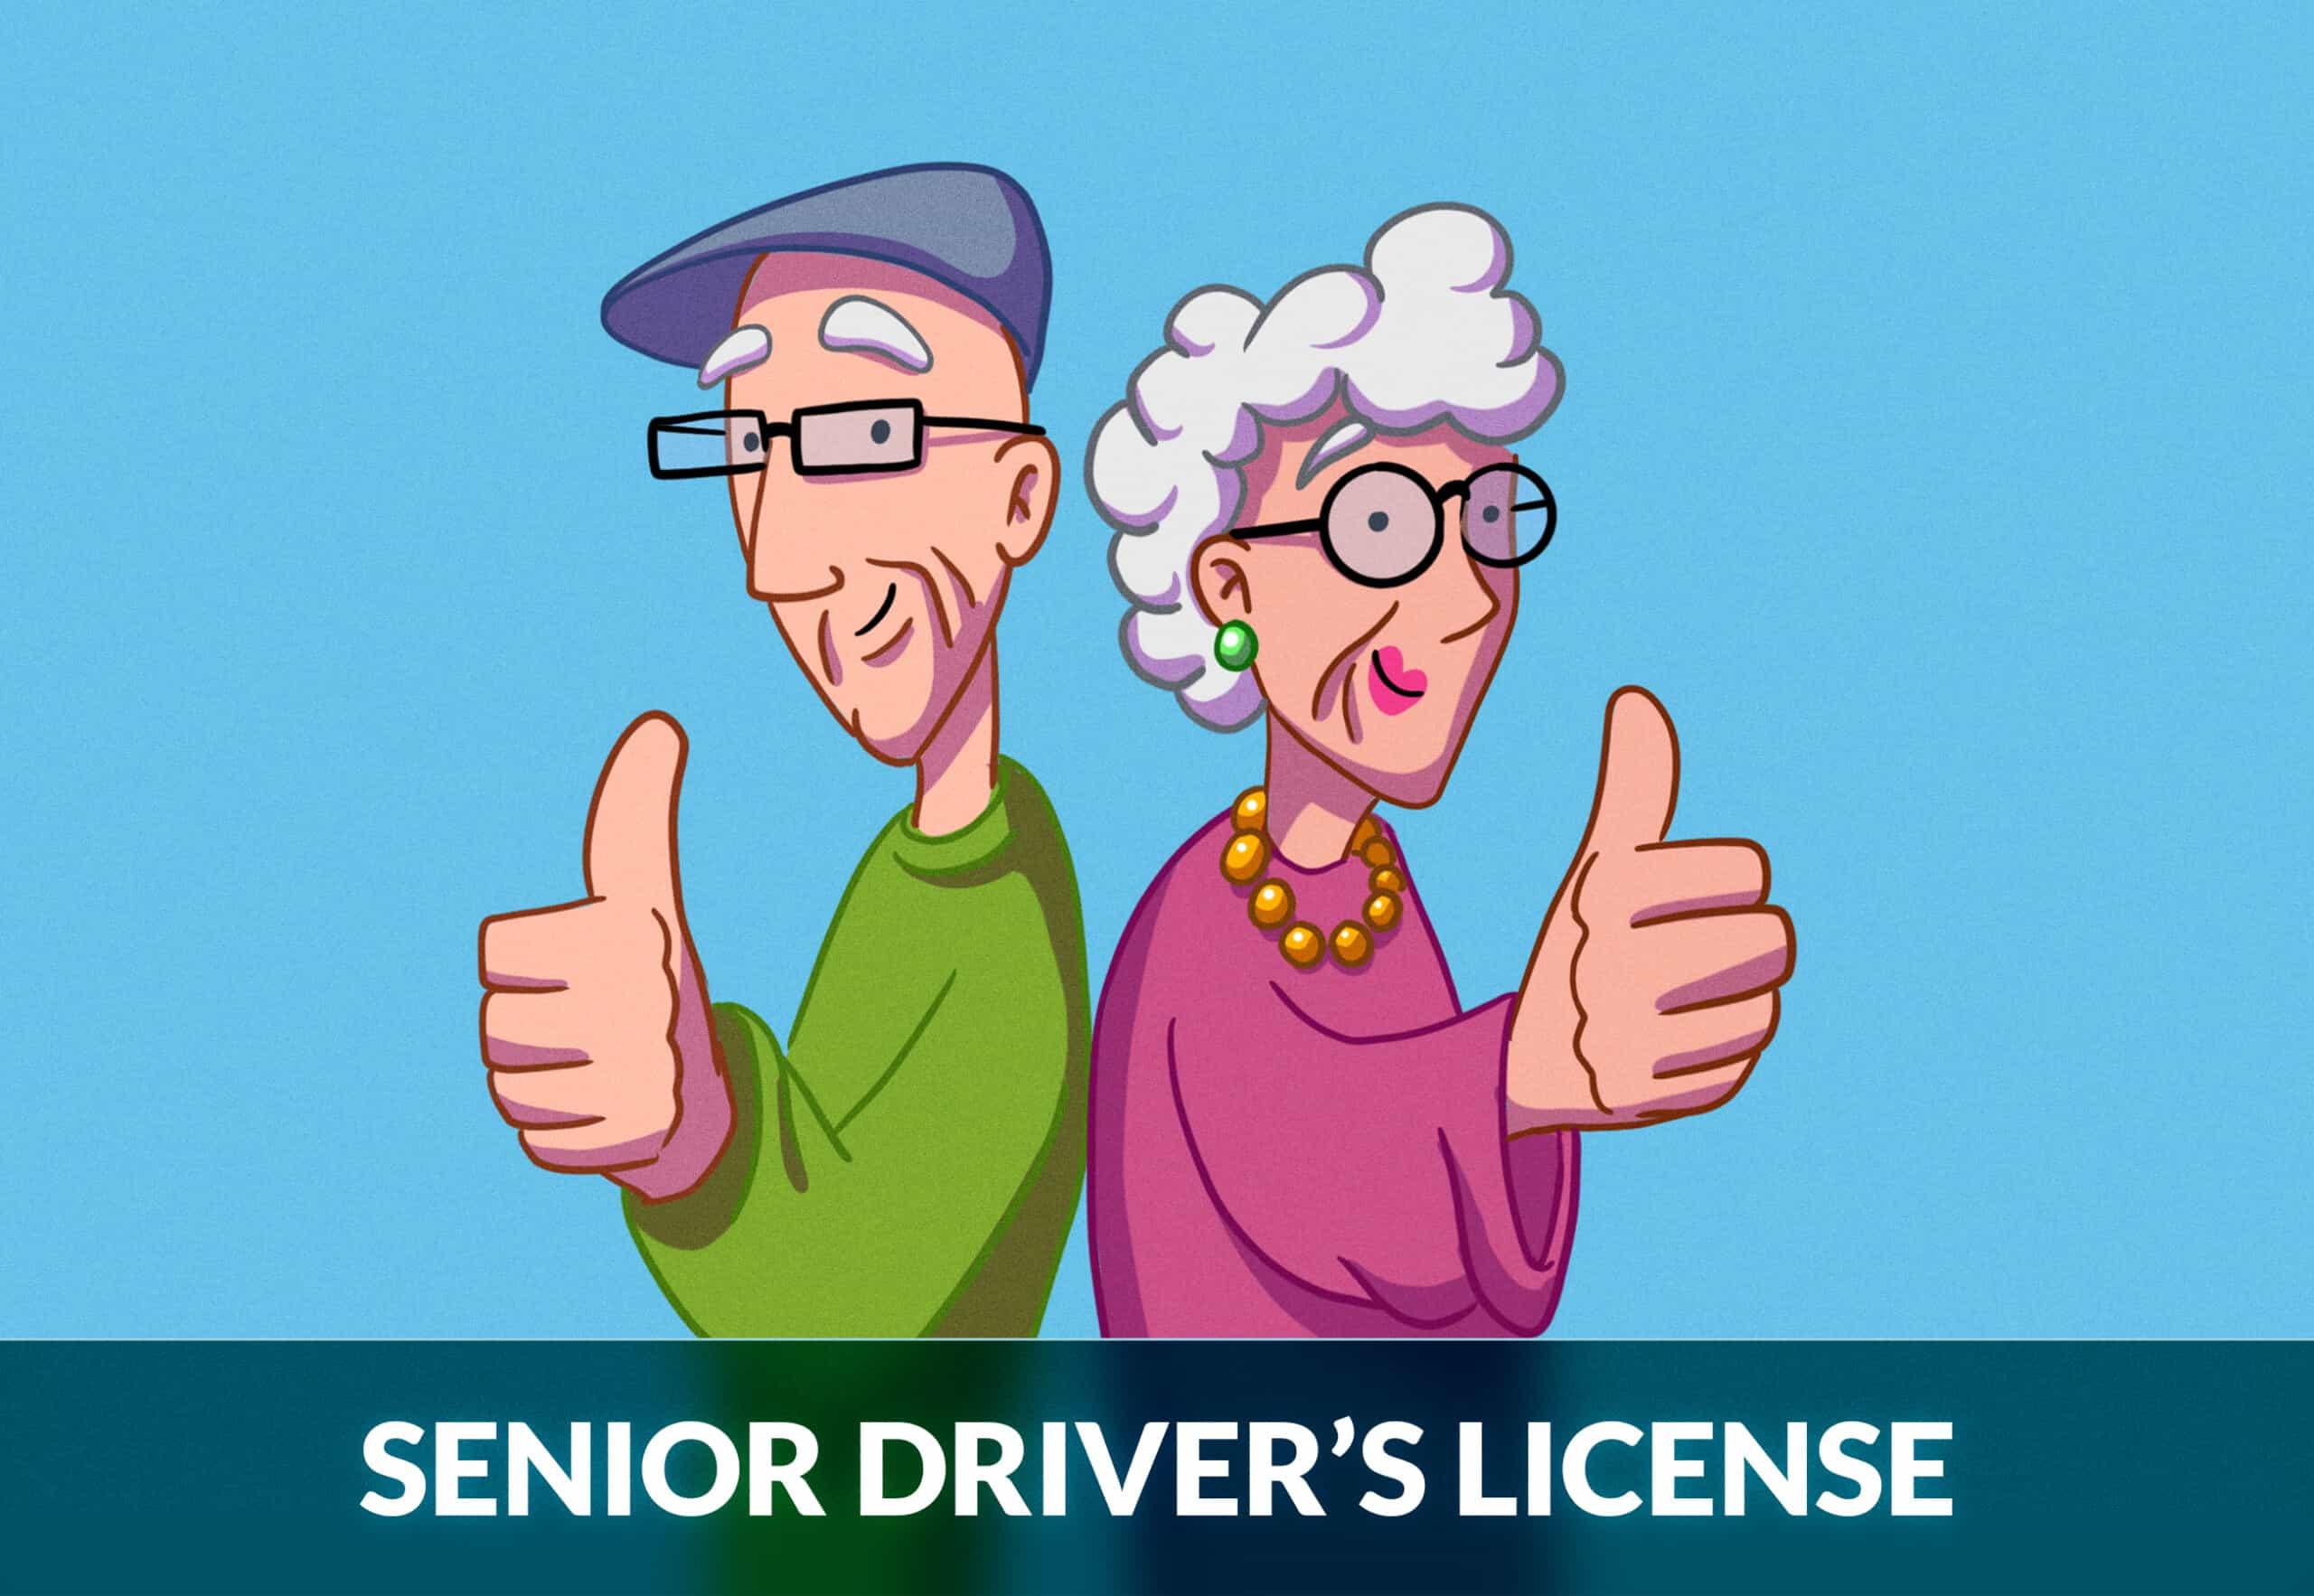 SENIOR DRIVER'S LICENSE